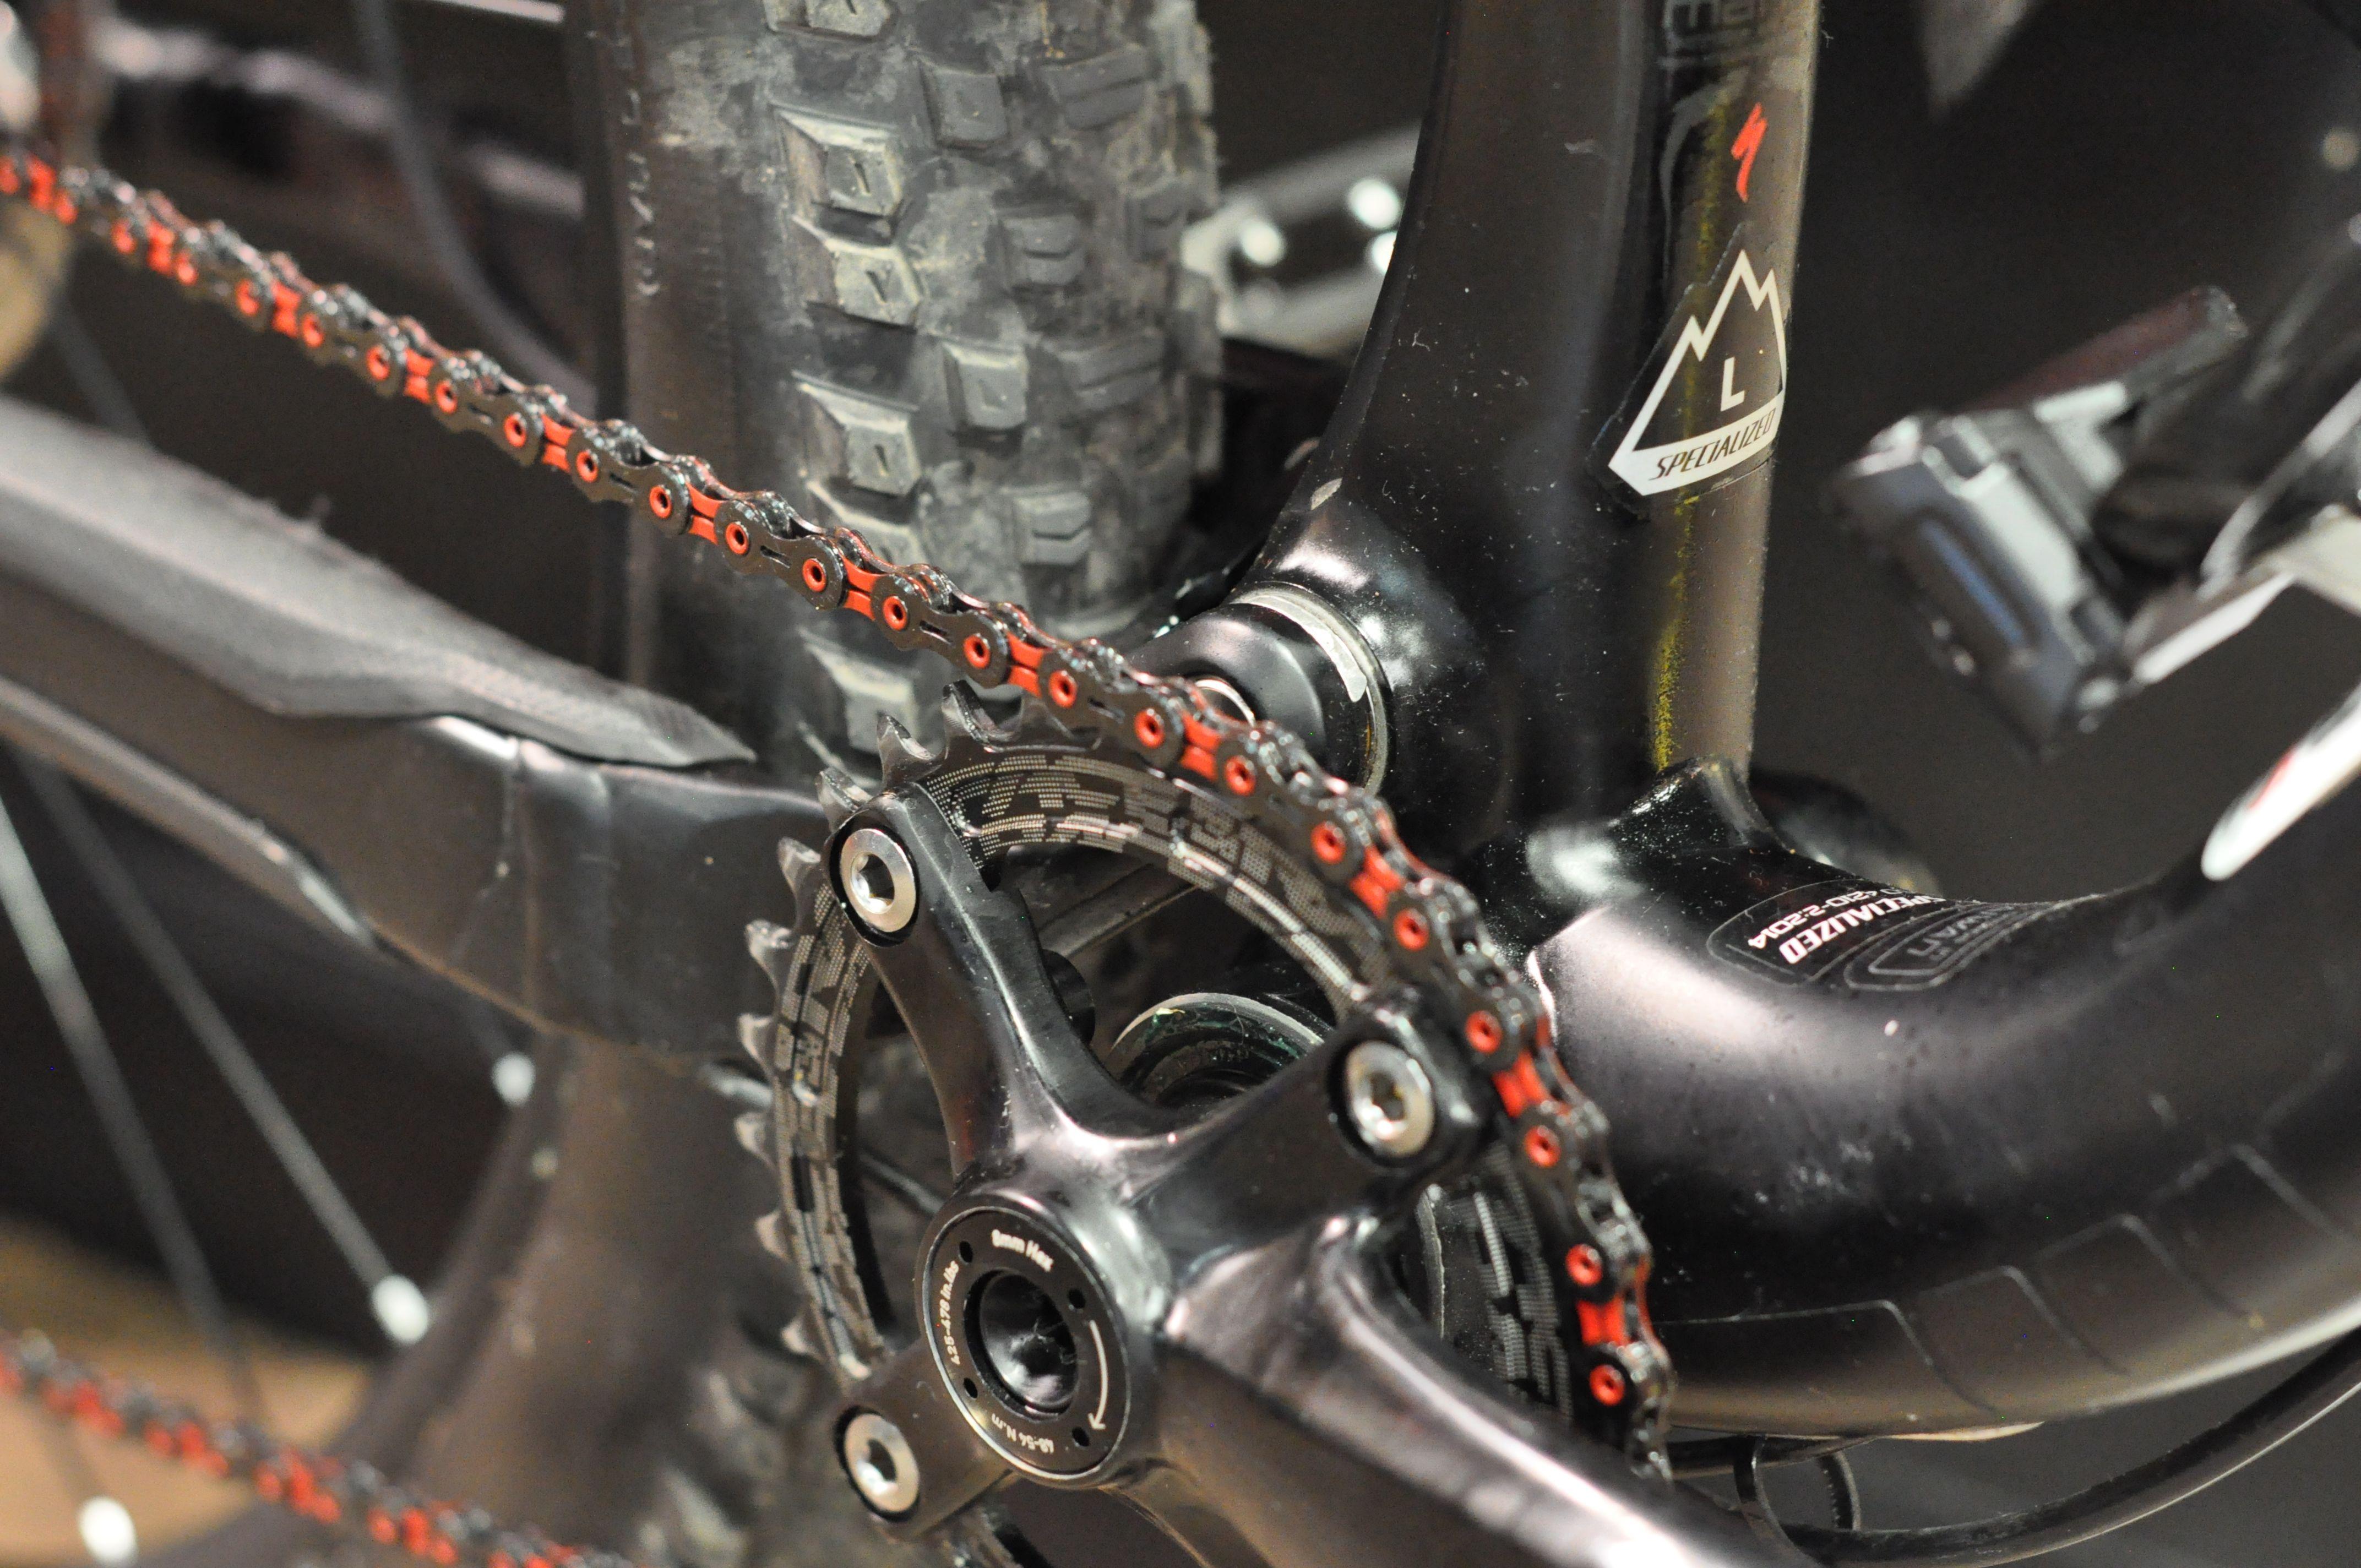 Global Bikes Bike Repair Colored Bike Chain Bike Repair